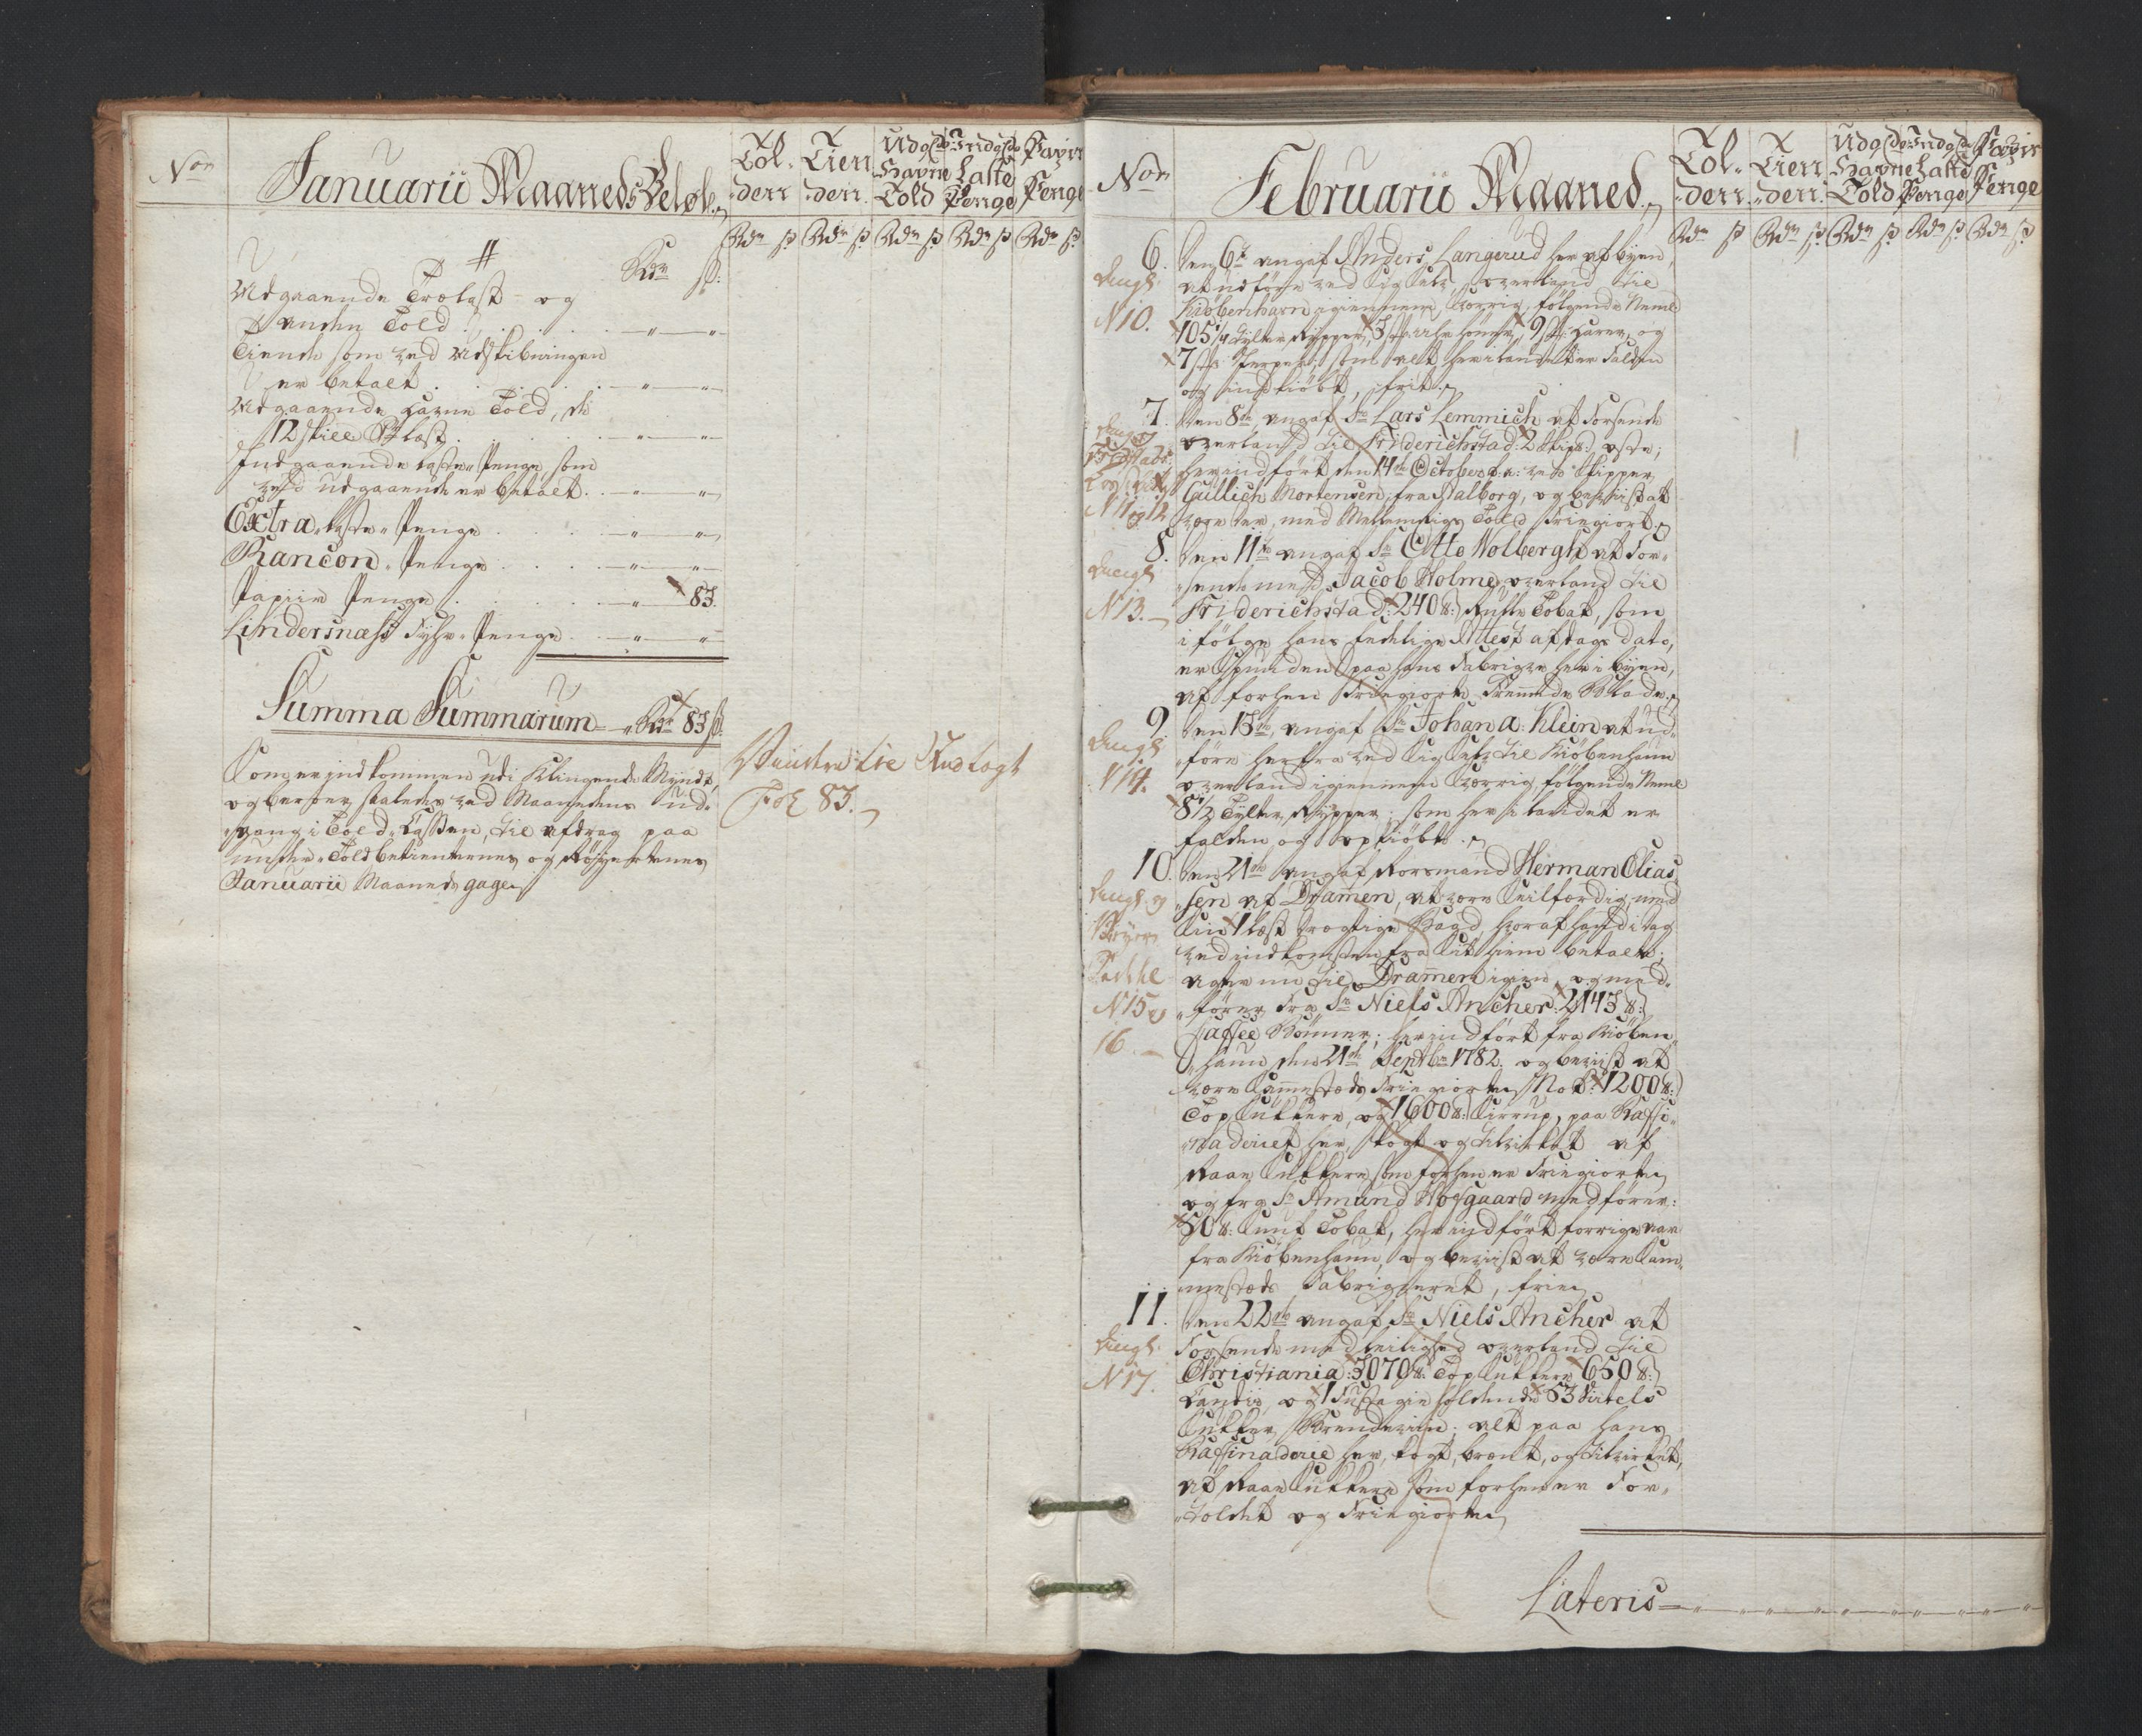 RA, Generaltollkammeret, tollregnskaper, R01/L0131: Tollregnskaper Fredrikshald, 1786, s. 2b-3a